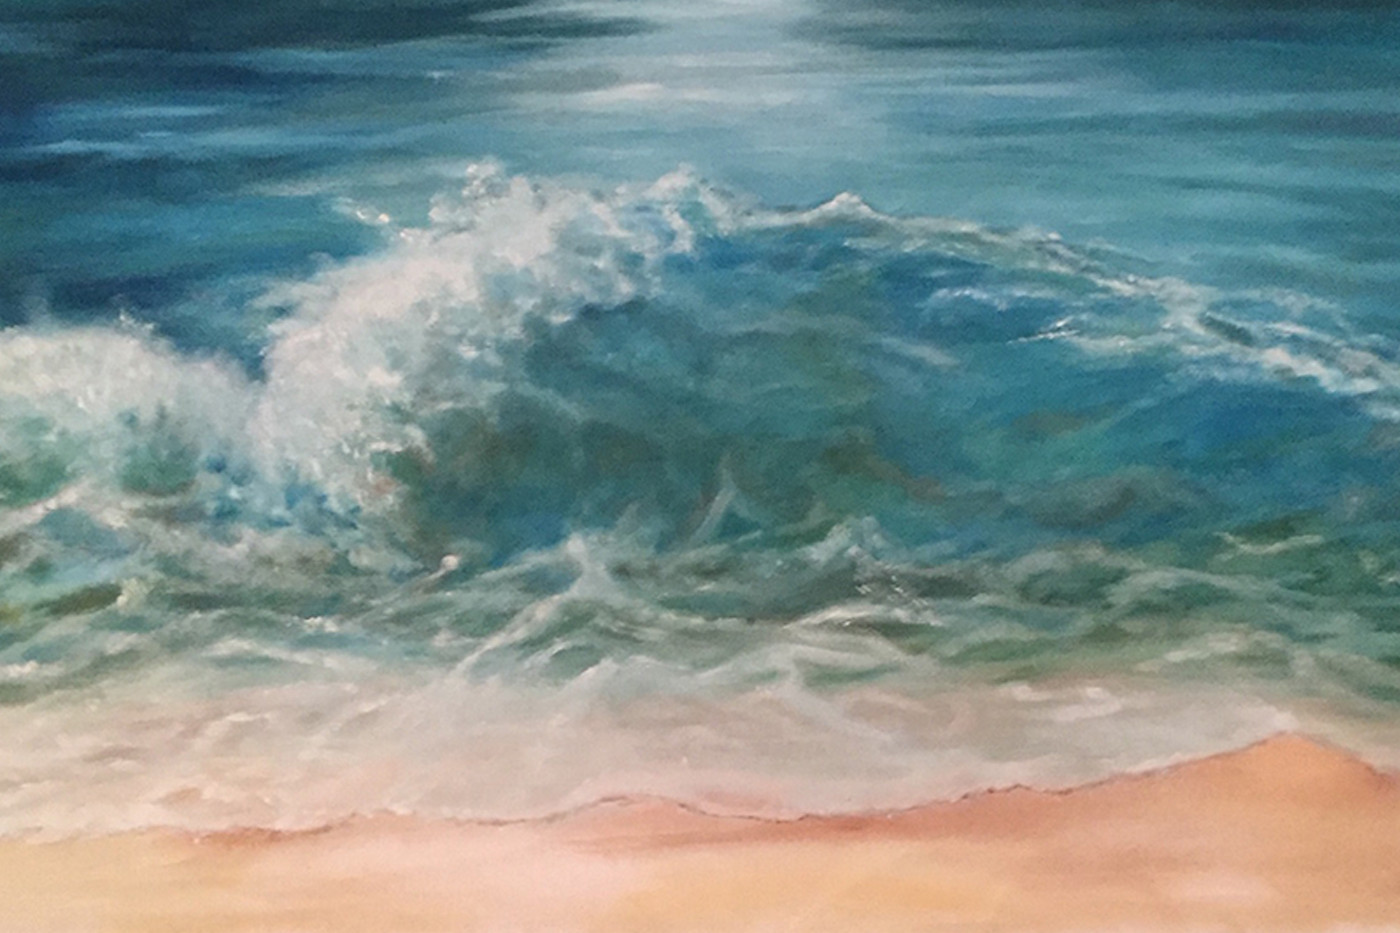 Ola     Wave